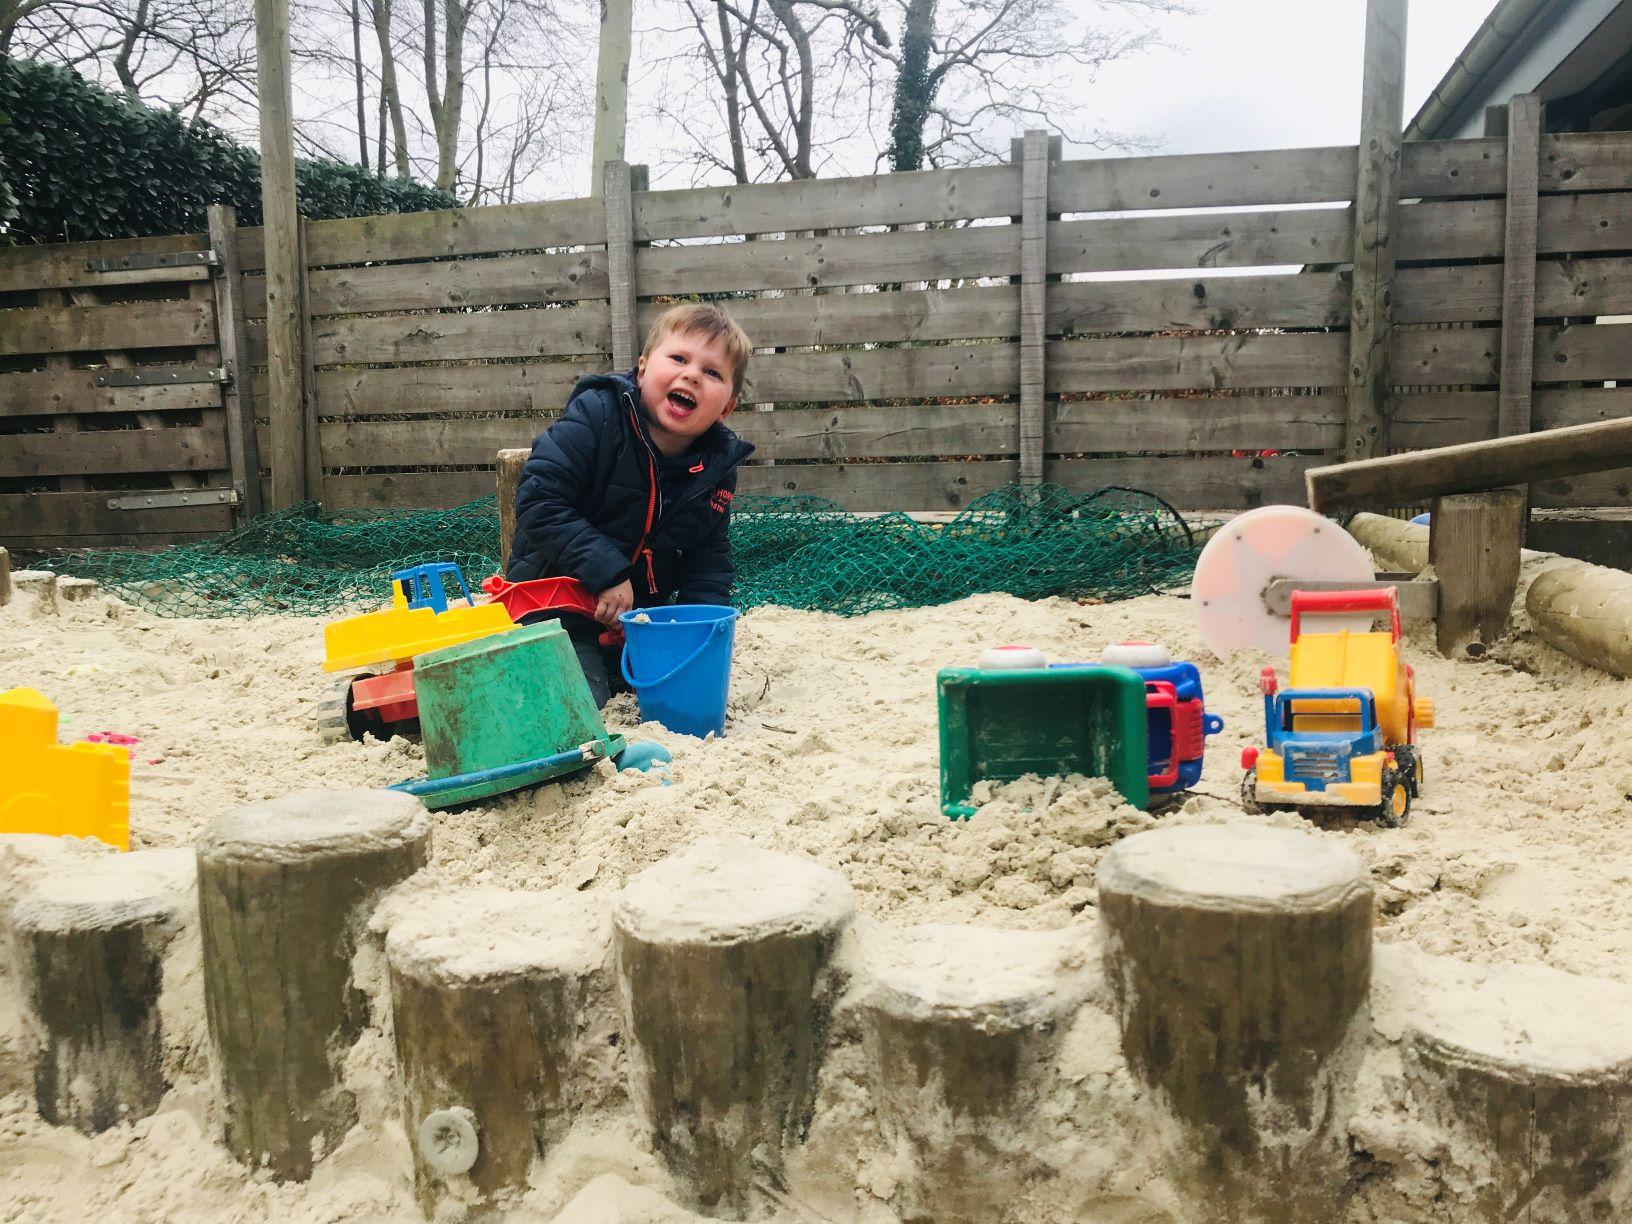 Hummelhof Engelbert kinderopvang peuteropvang buitenschoolse opvang